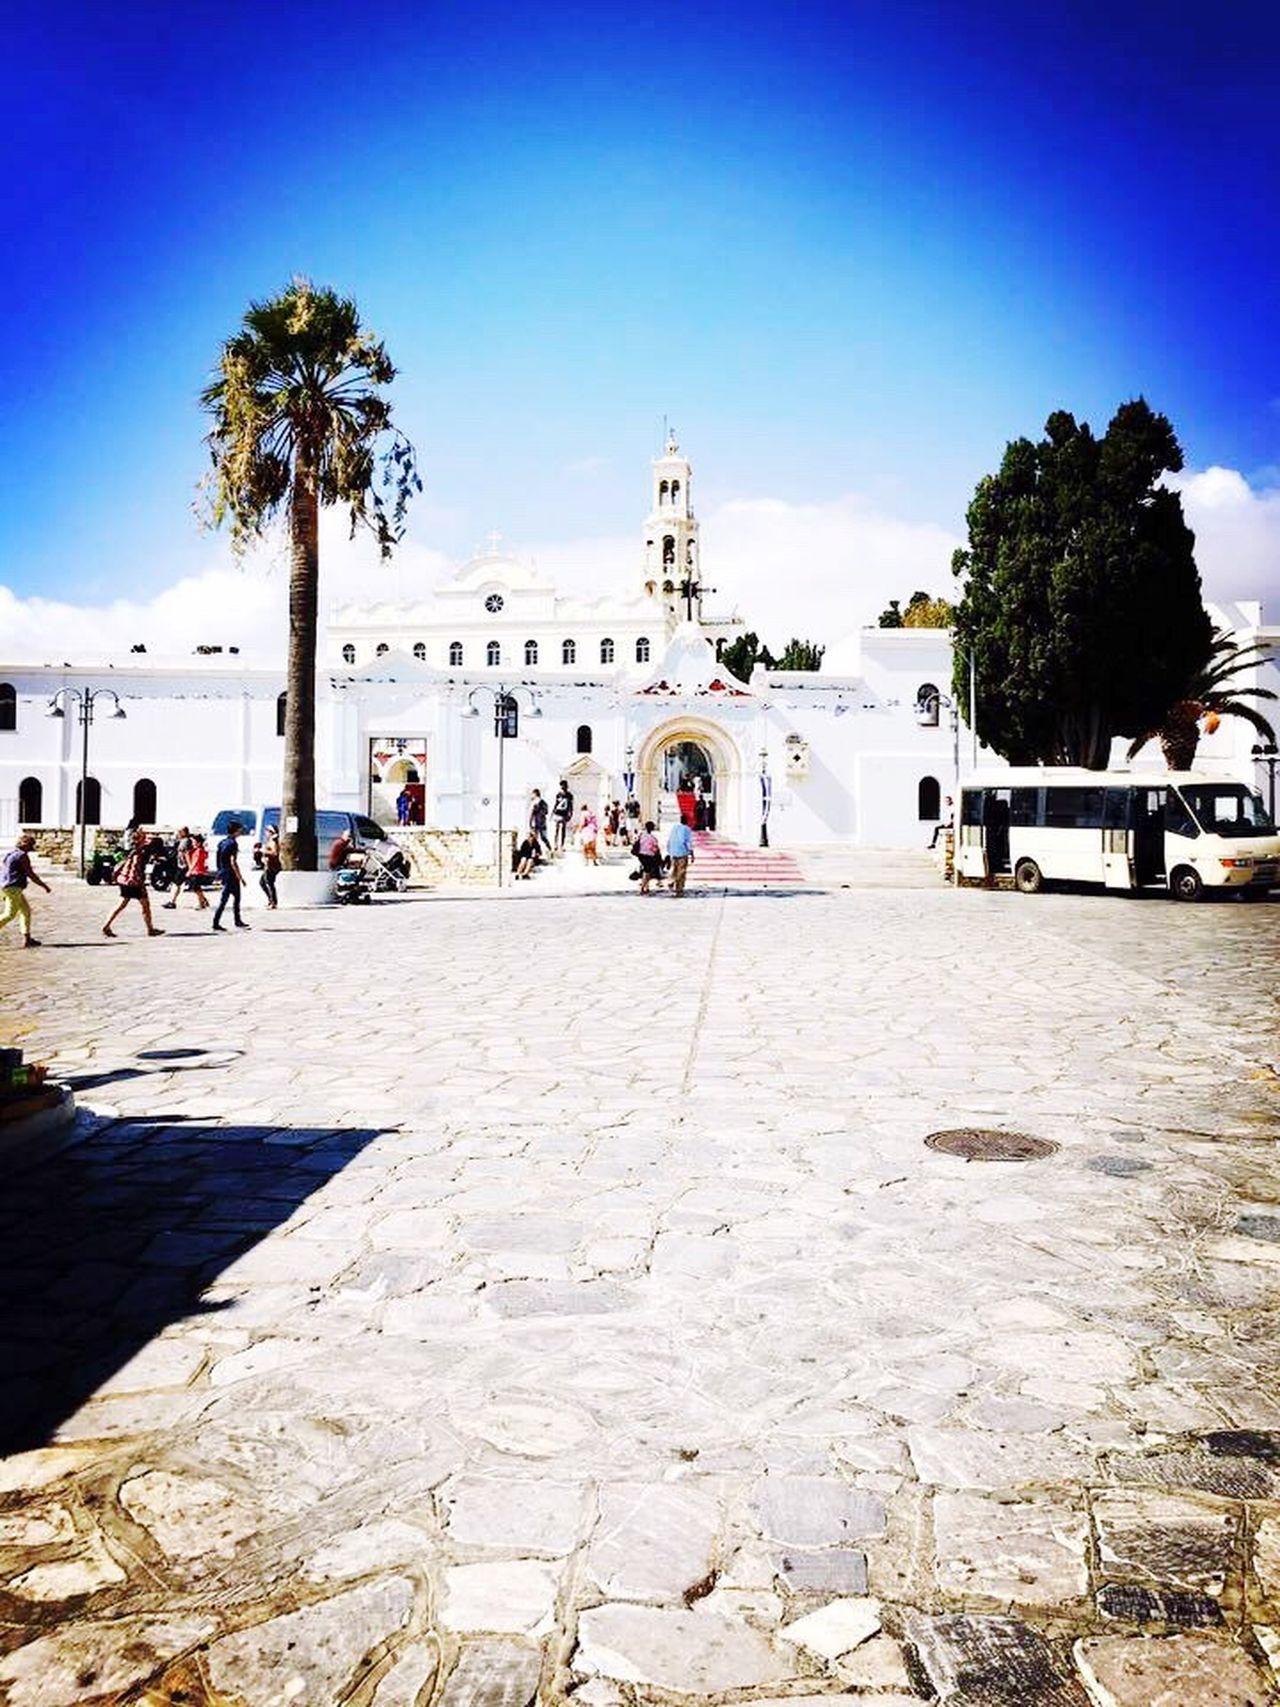 Tinos Island Grecce Santa Maria Church Sunny Day Good Time